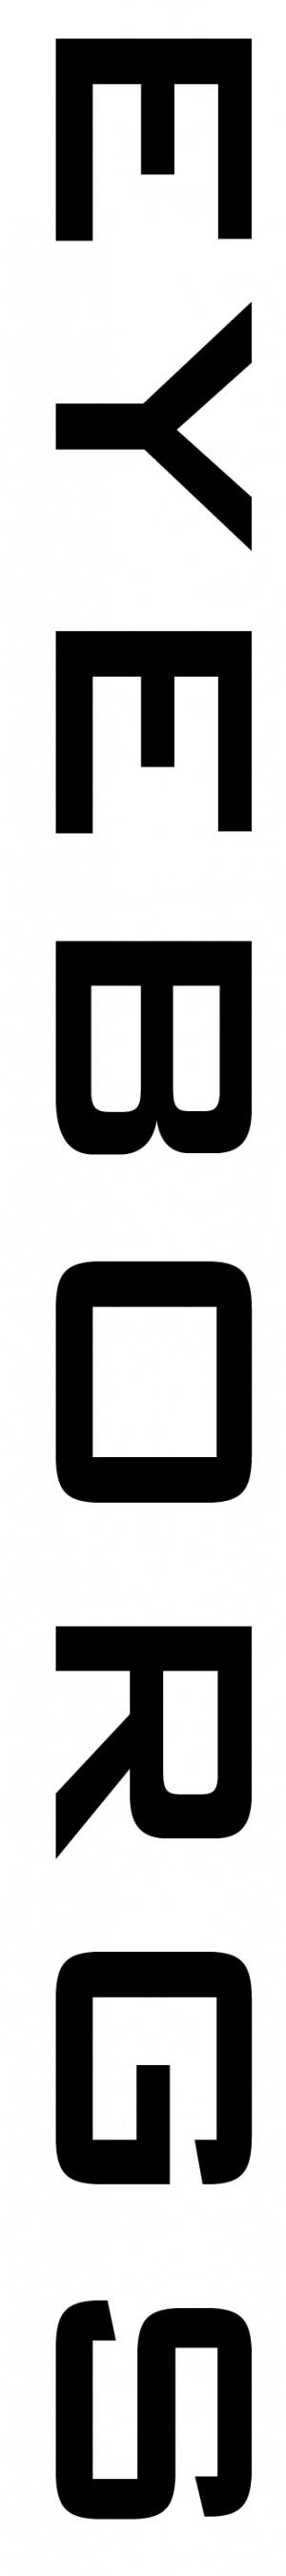 Eyeborgs 333x3000